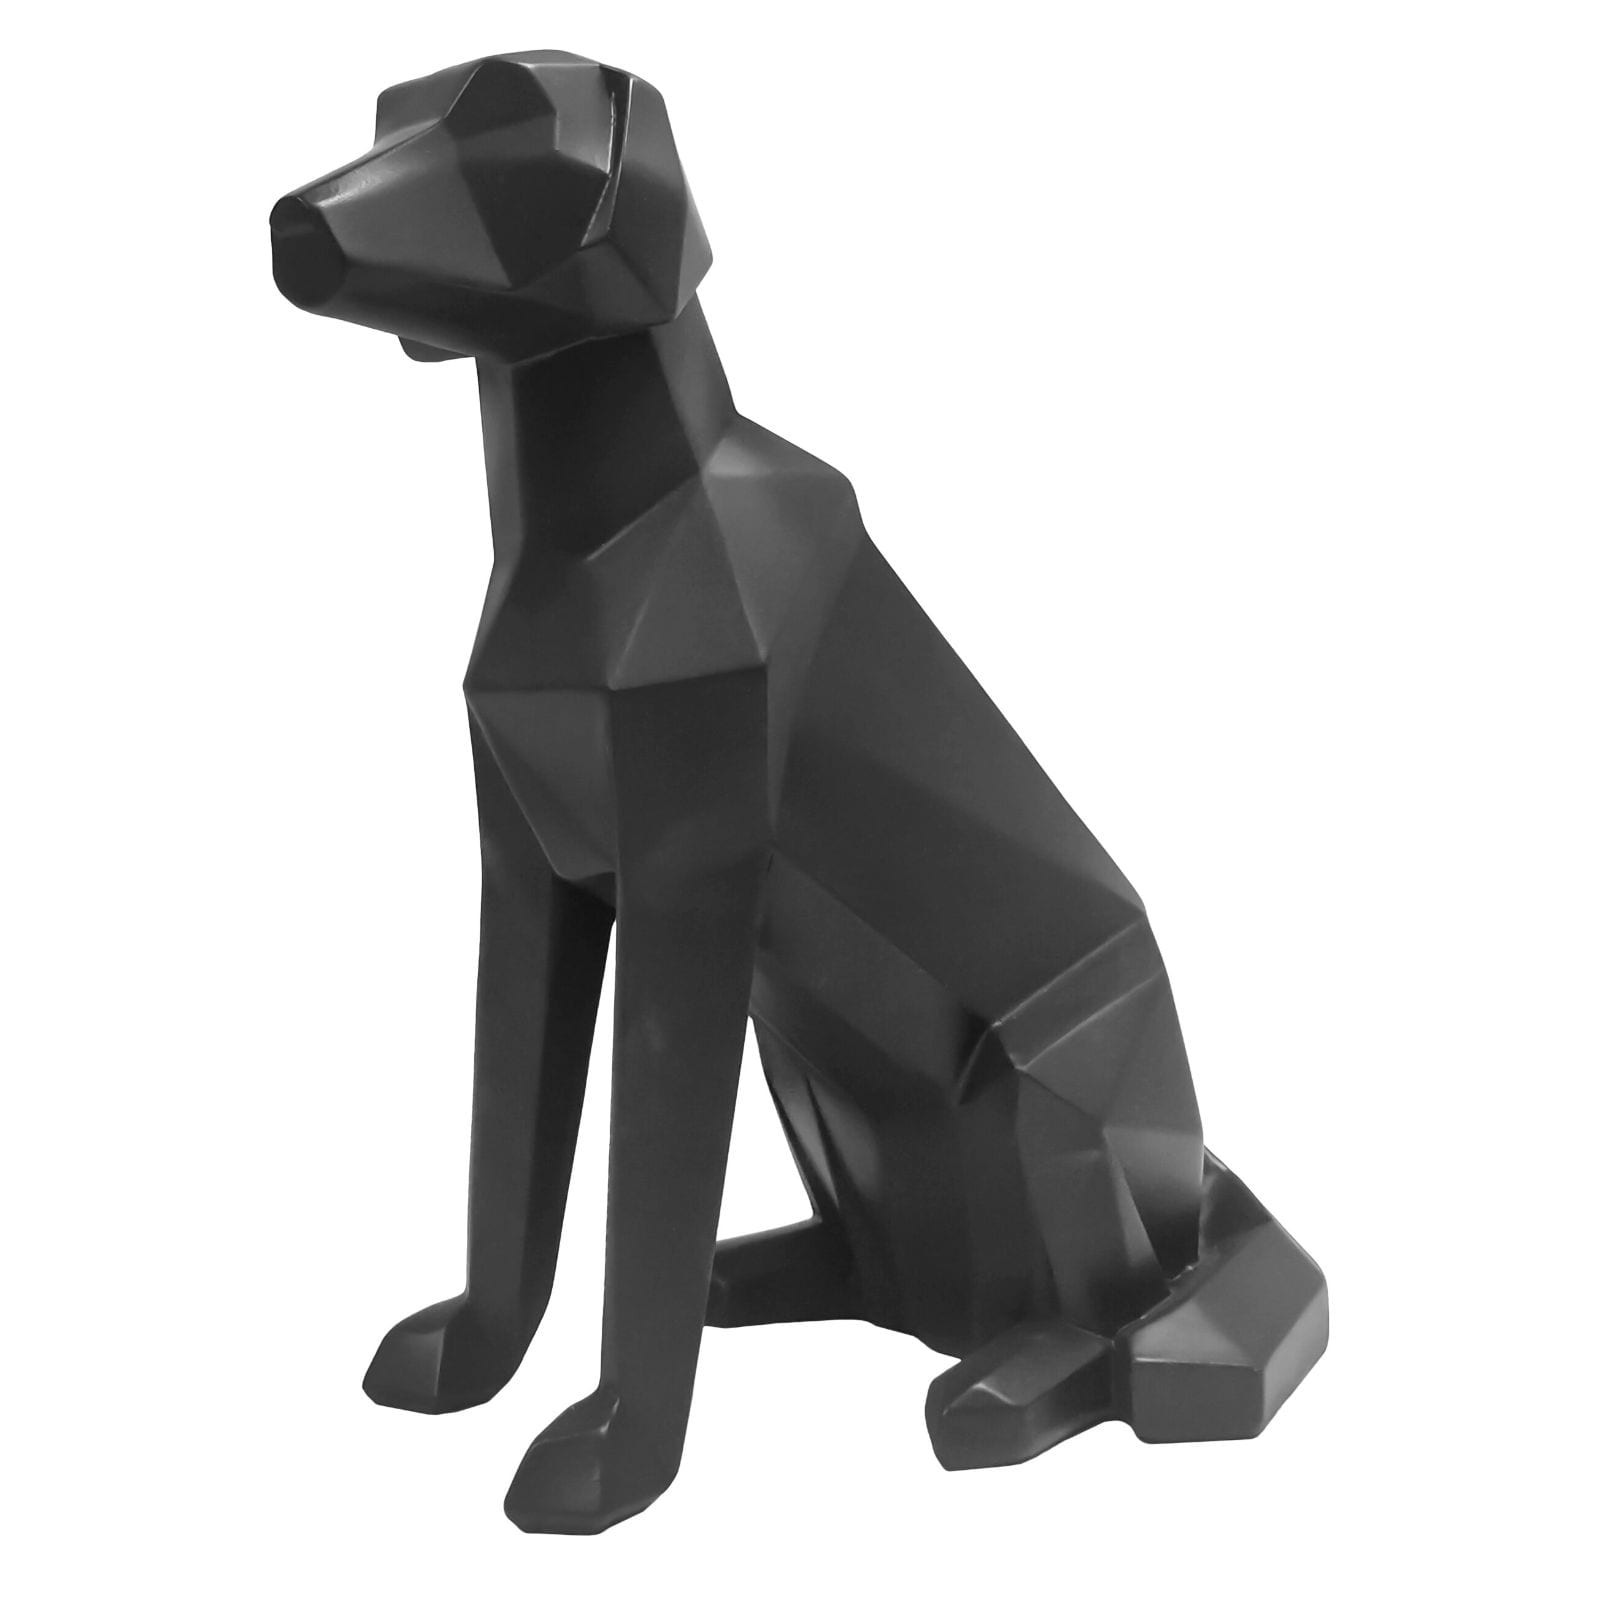 Origami Dog Sitting Statue (Black) - Present Time